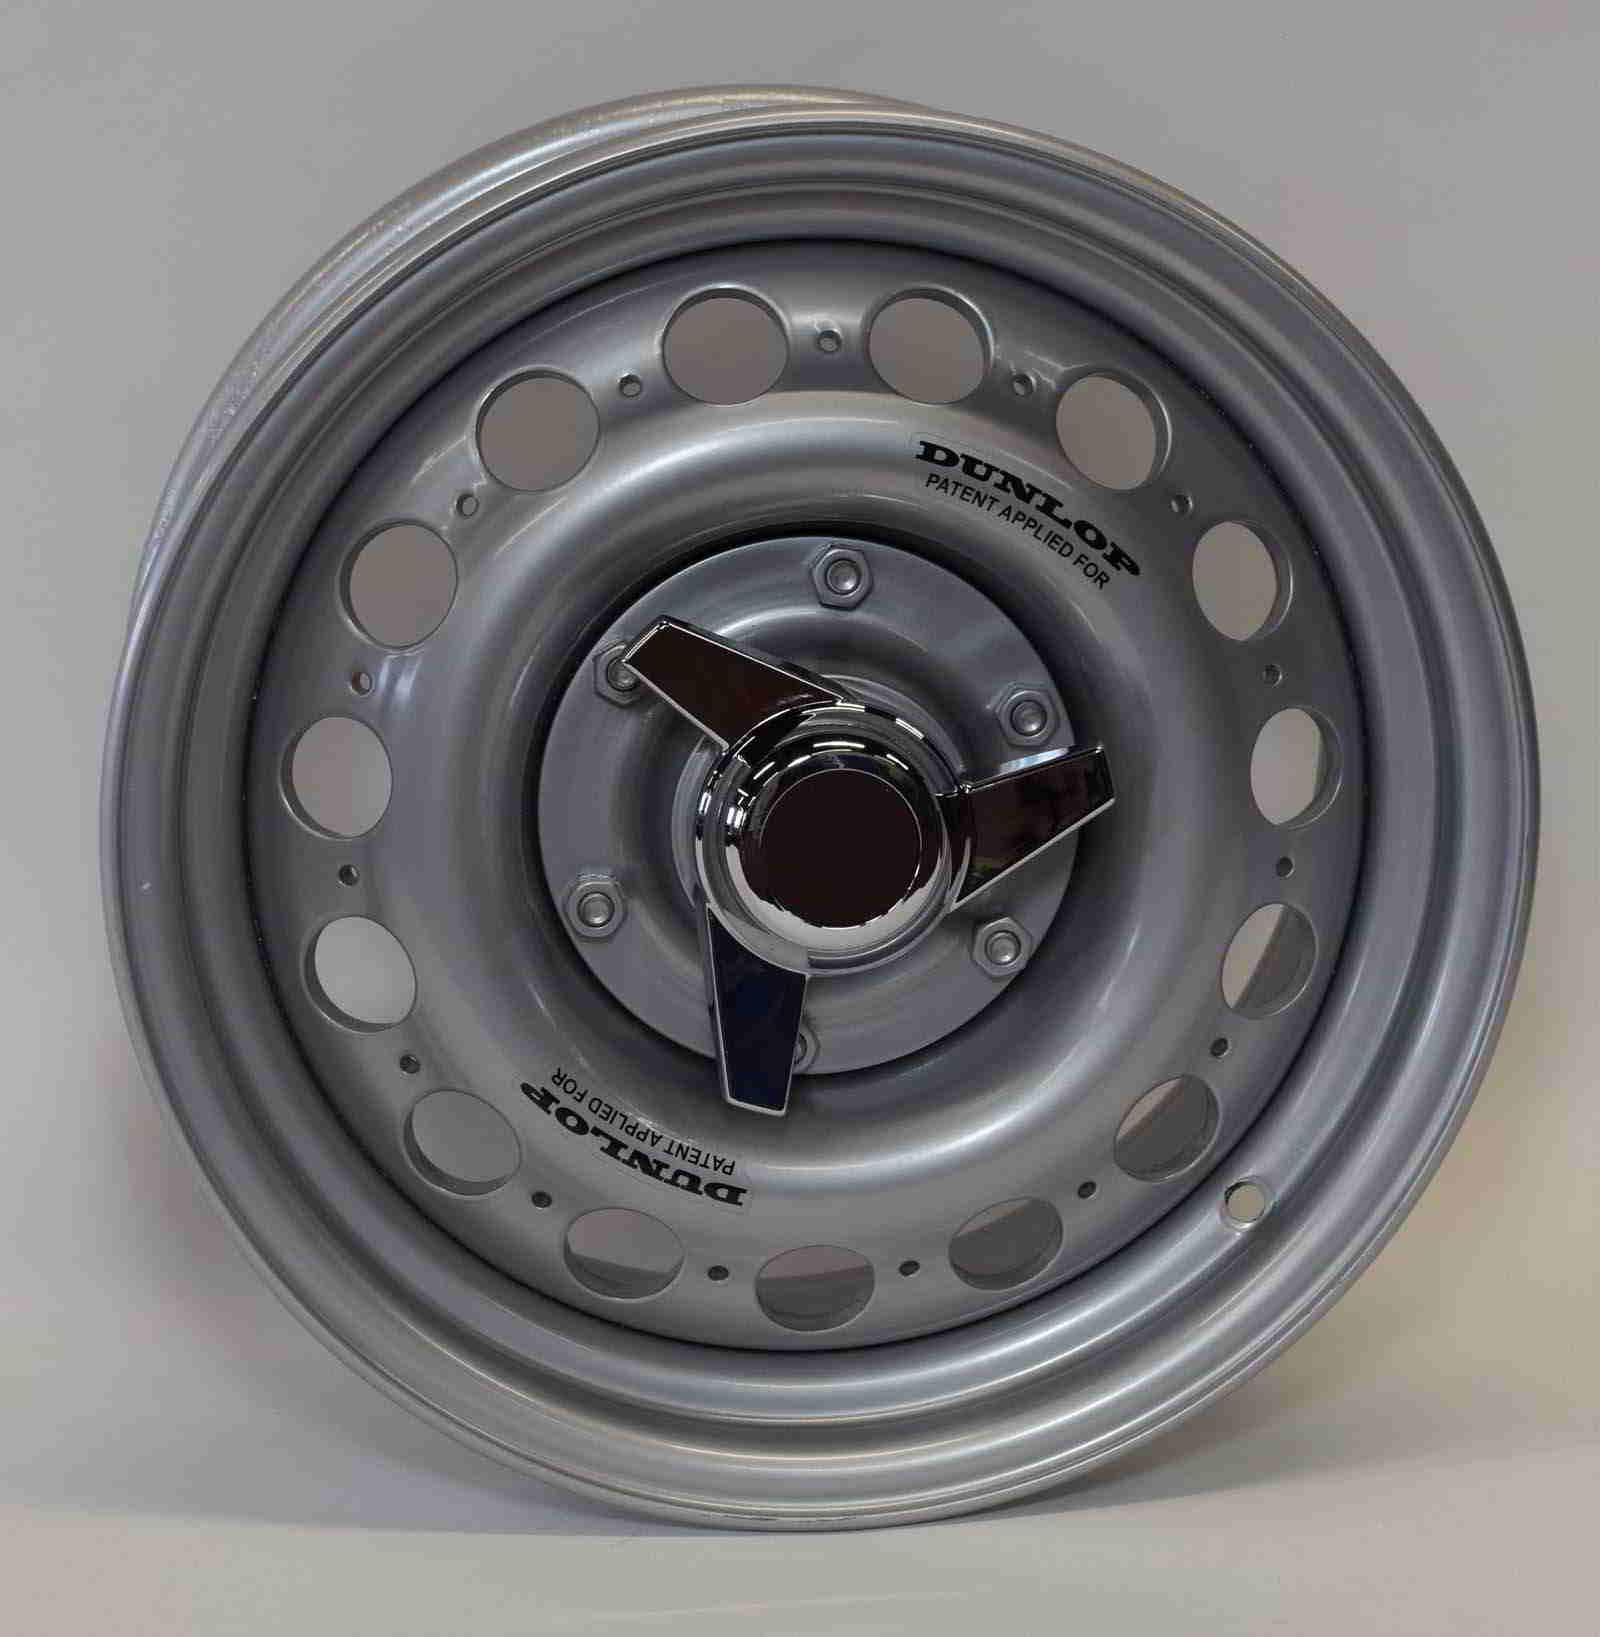 Dunlop style alloy wheels 15×7 6